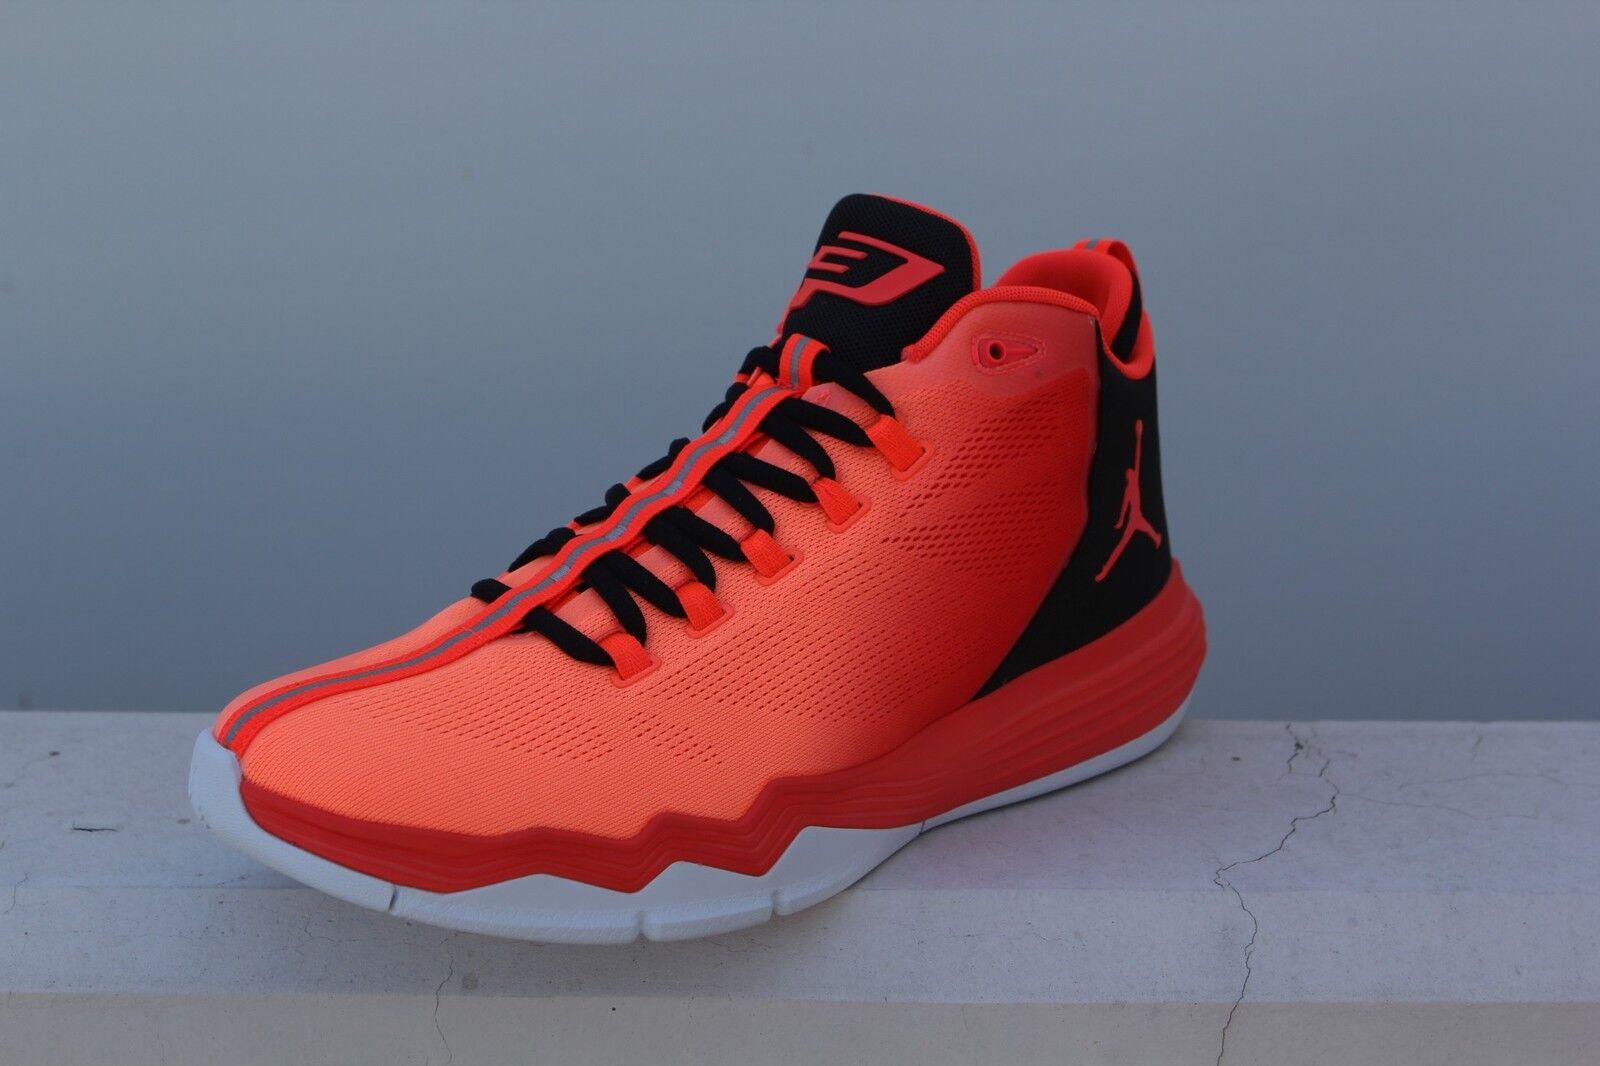 833909-603 jordan männer jordan cp3.ix ae basketball infrarot - schuh (red / infrarot basketball - 23 / infr 35c679